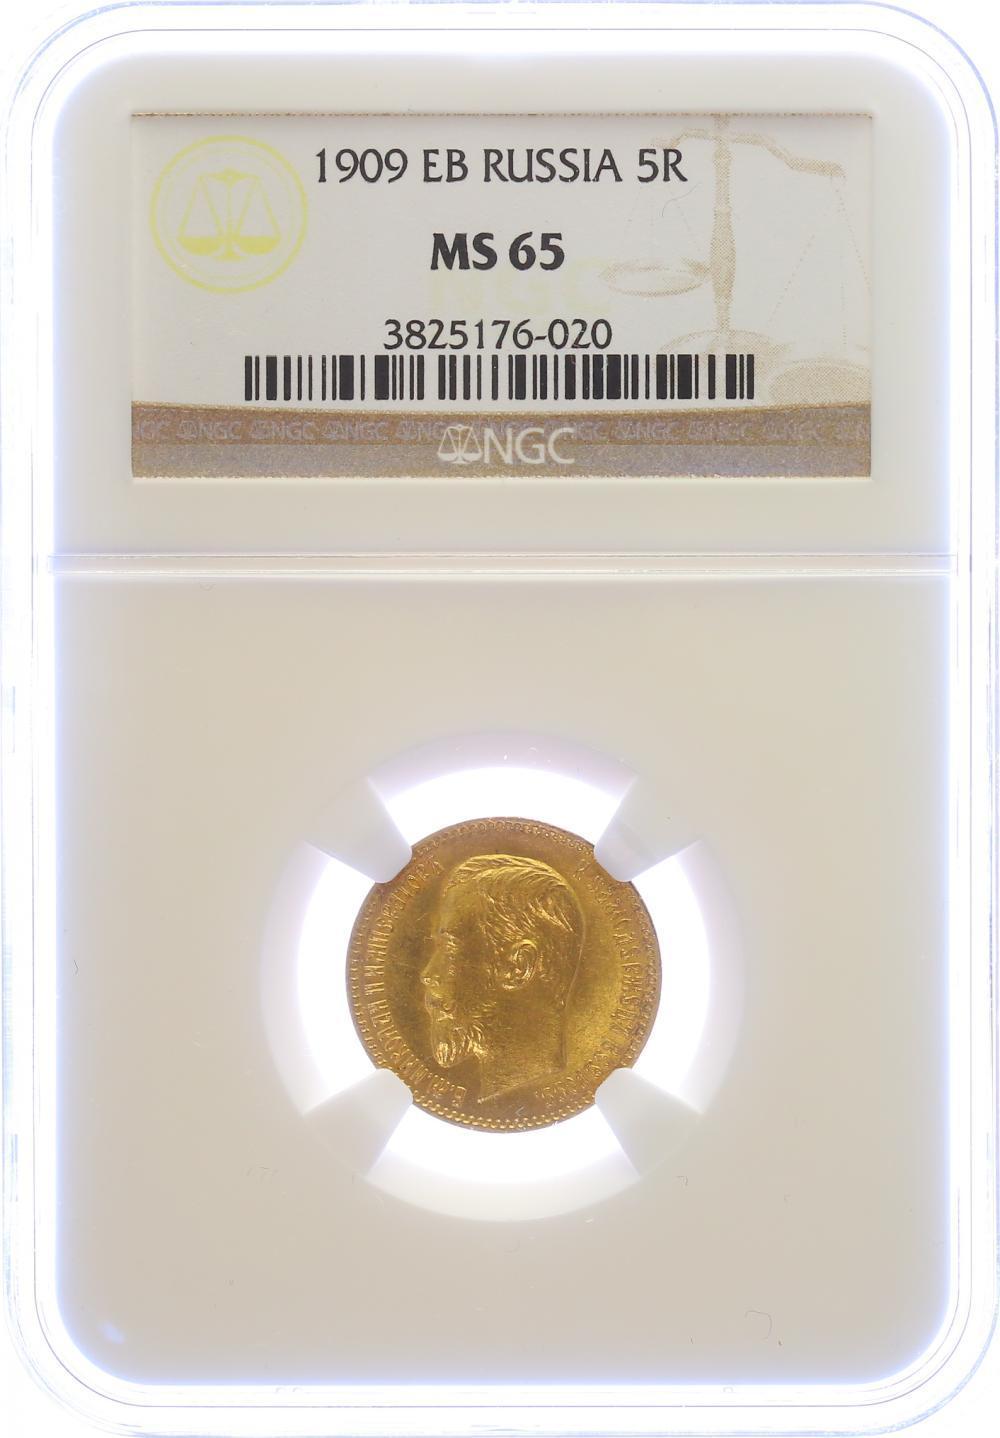 a27bda12b NumisBids: Aurea Numismatika Praha E-Auction 15, Lot 4100 : Rusko, Mikuláš  II., 1894 - 1917 5 Rubl 1909 EB, St. Peterburg,.